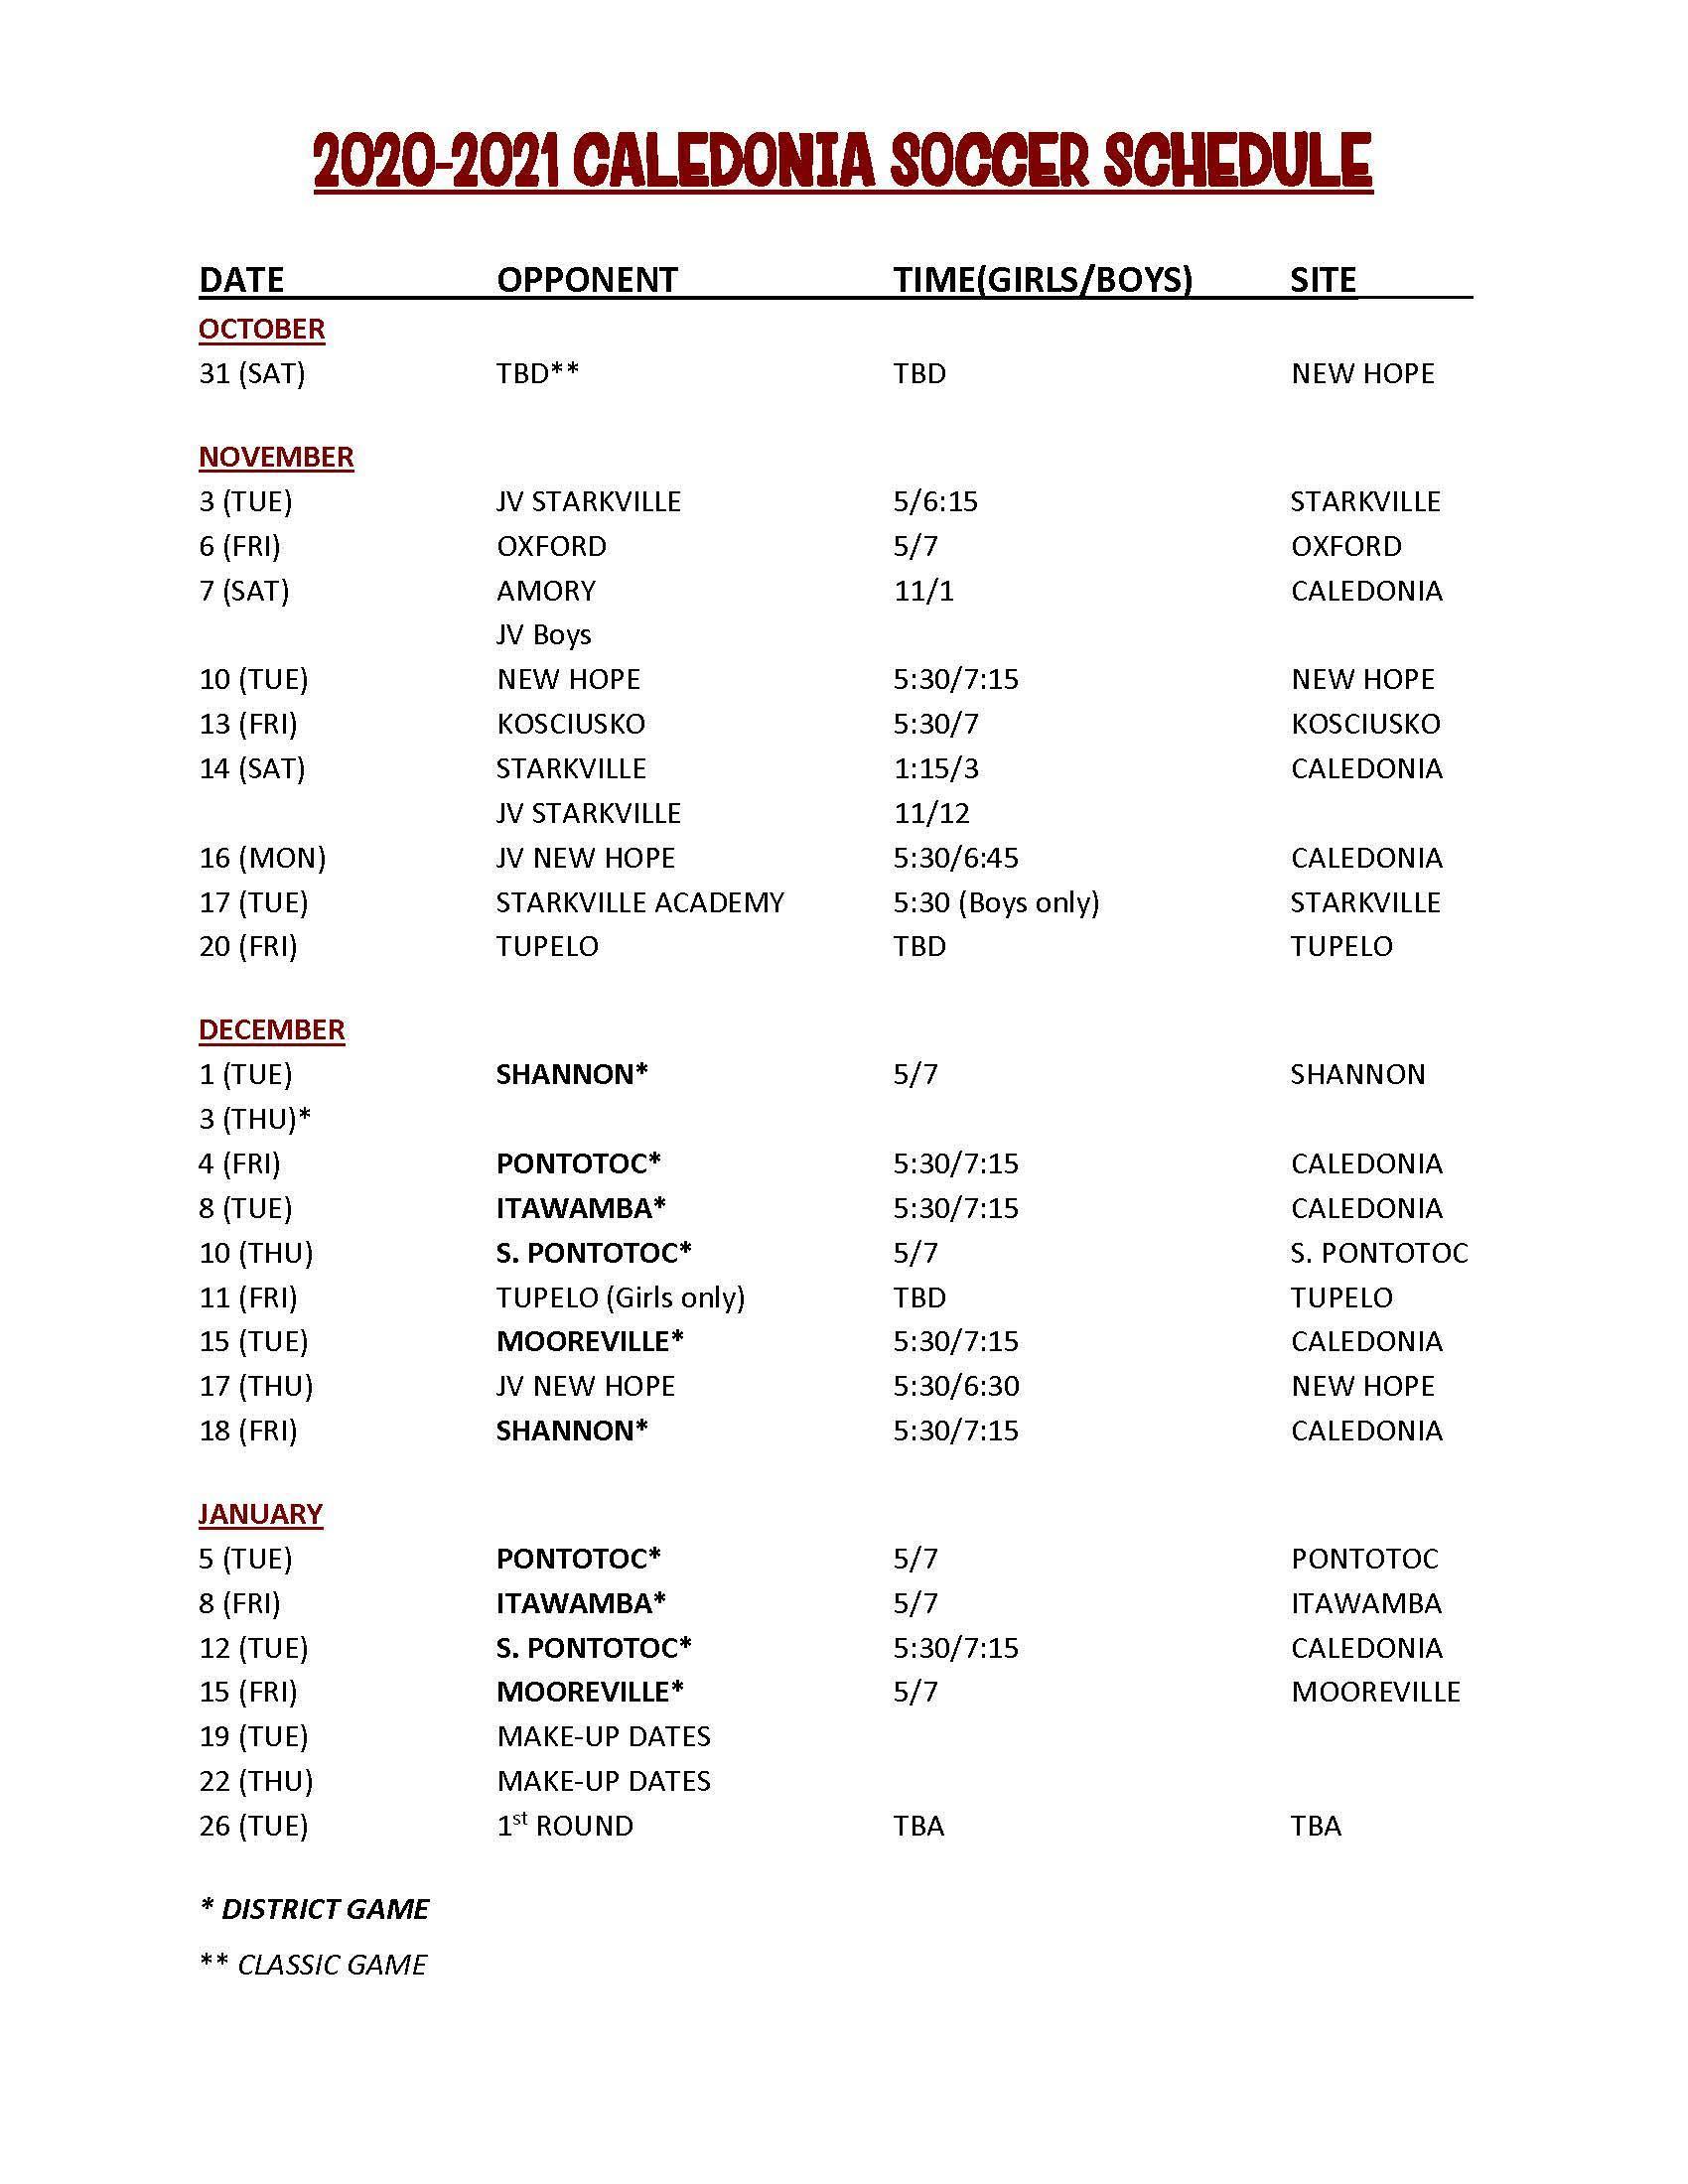 2020 Soccer Schedule